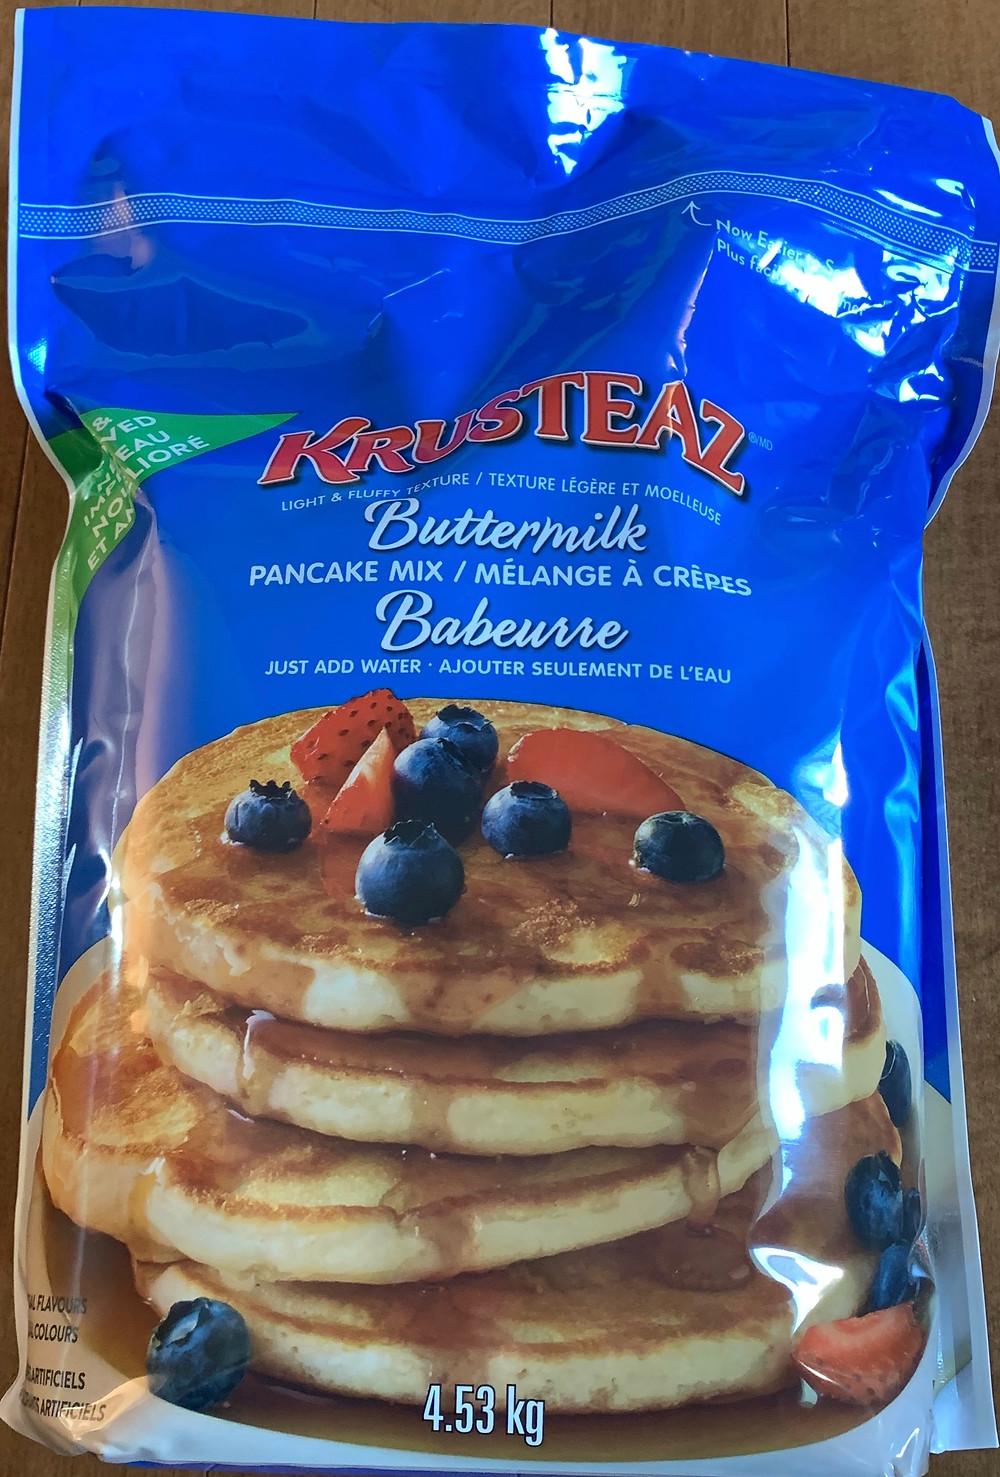 Costco Krusteaz Buttermilk Pancake Mix